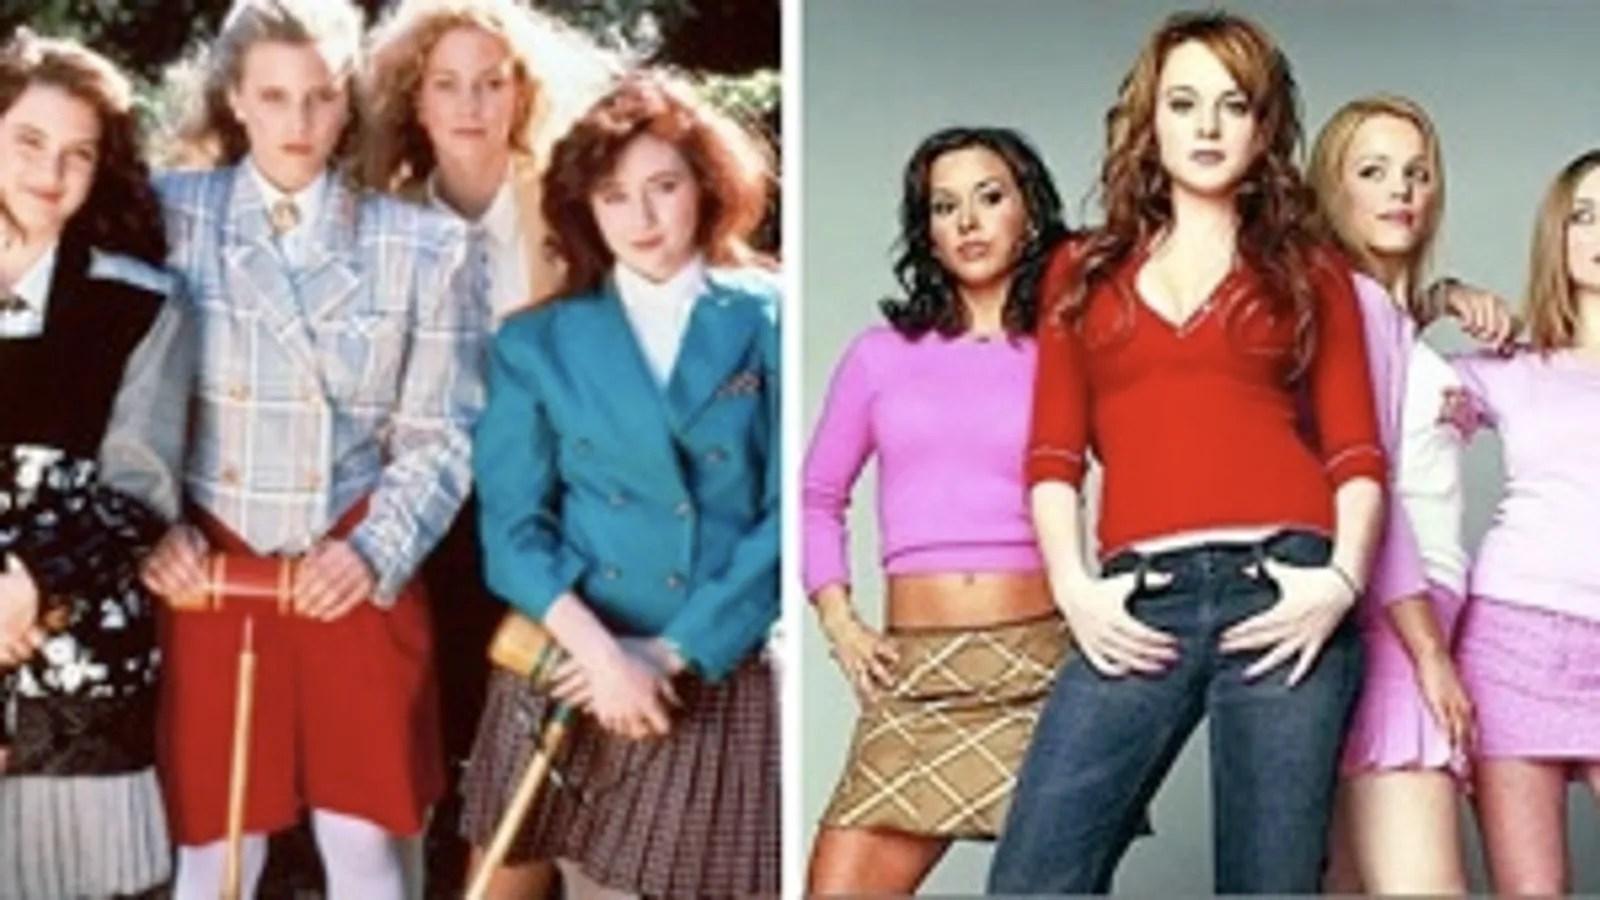 Mean Girls Musical Wallpaper Jezebel Faceoff The Heathers Vs The Plastics